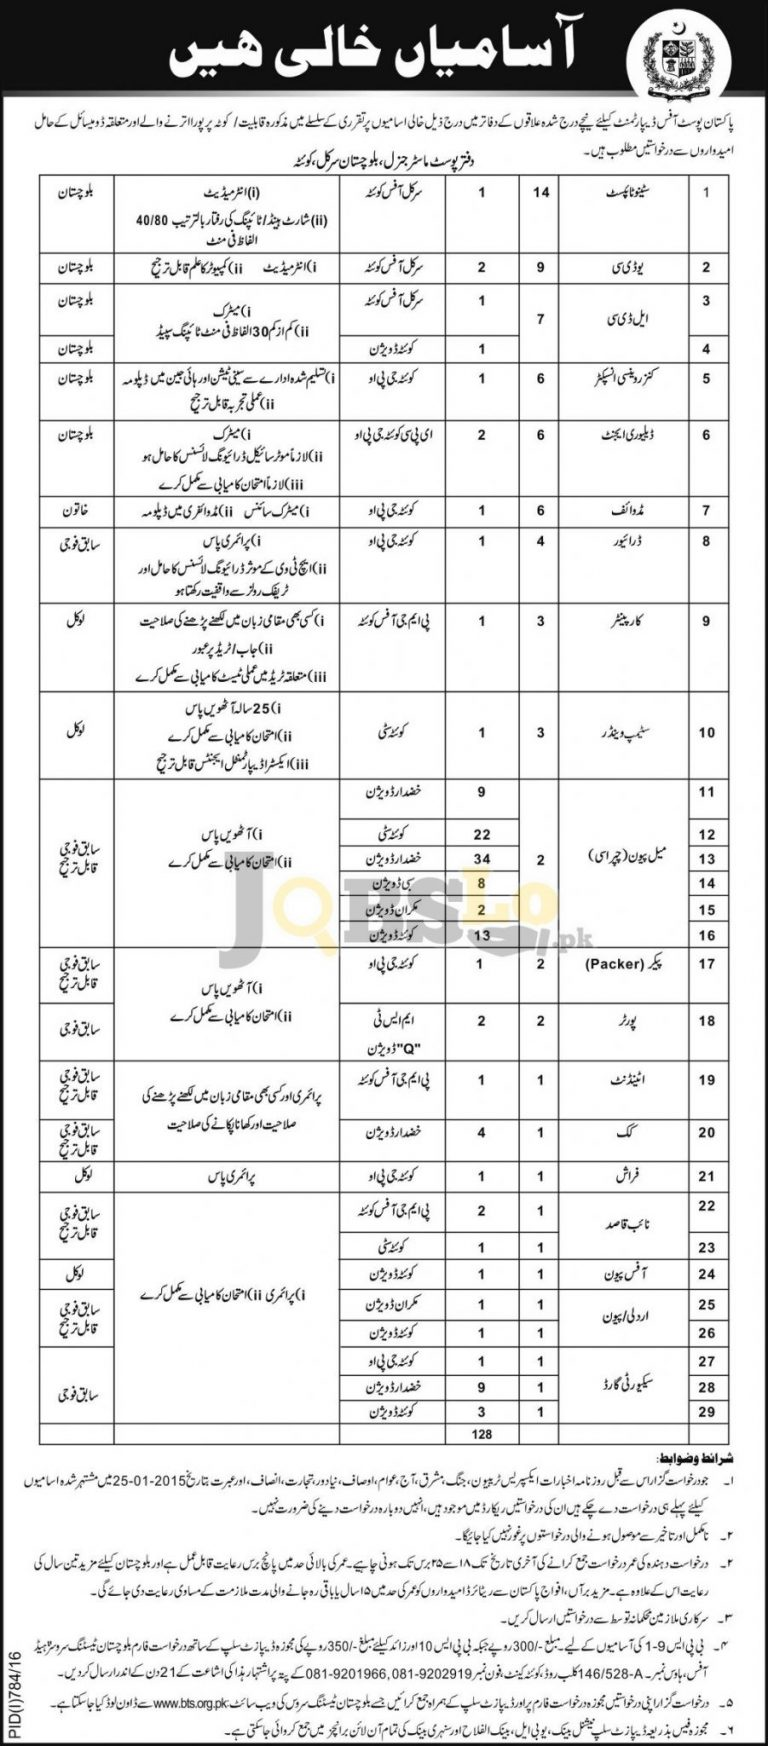 Pakistan Post Office Jobs August 2016 BTS Online Form Download www.bts.org.pk